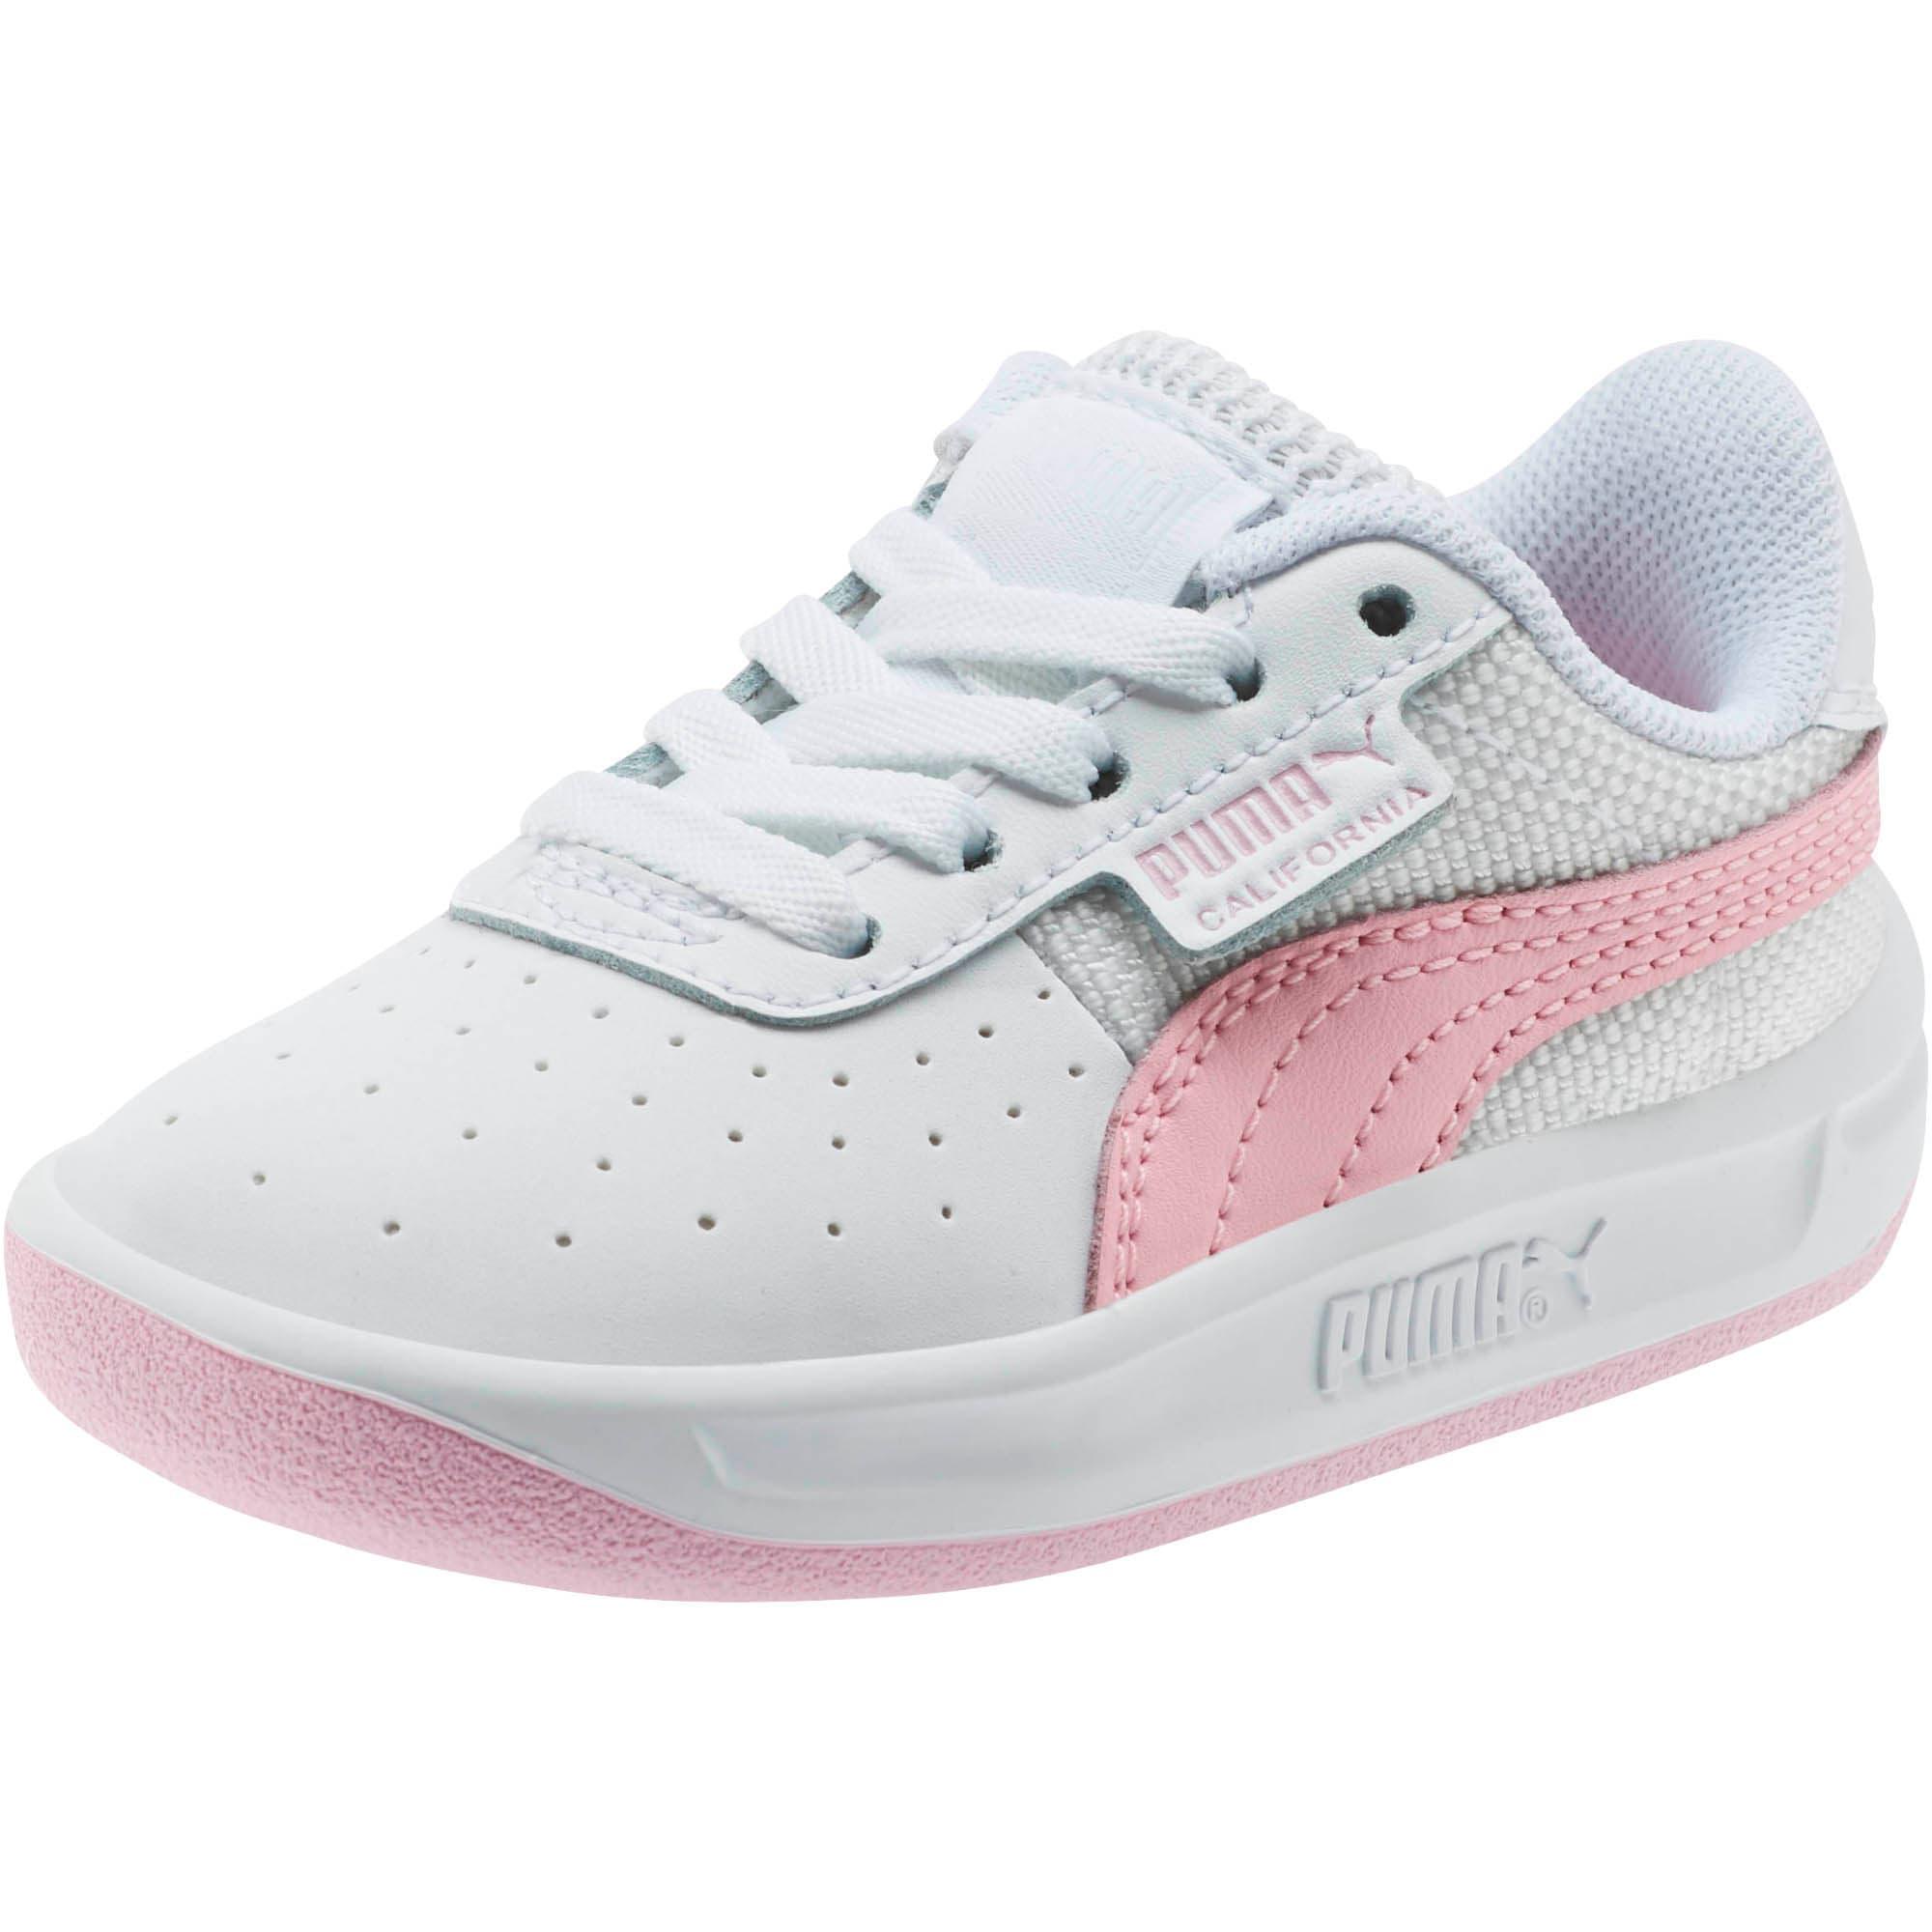 Thumbnail 1 of California Toddler Shoes, Puma Wht-Pale Pink-Puma Wht, medium